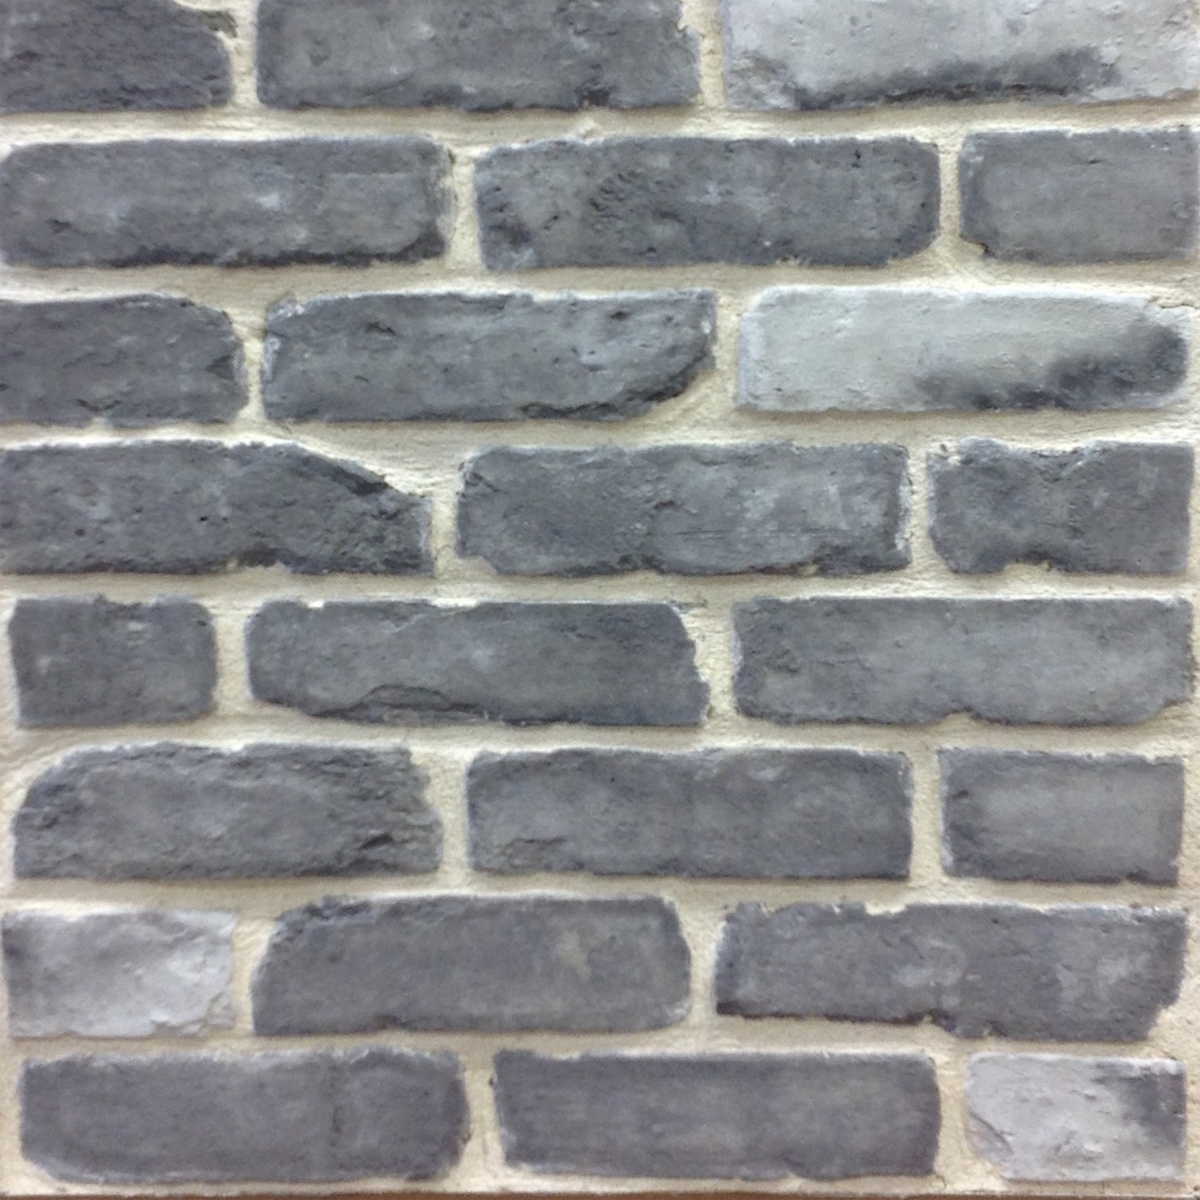 Eastern Concrete Materials